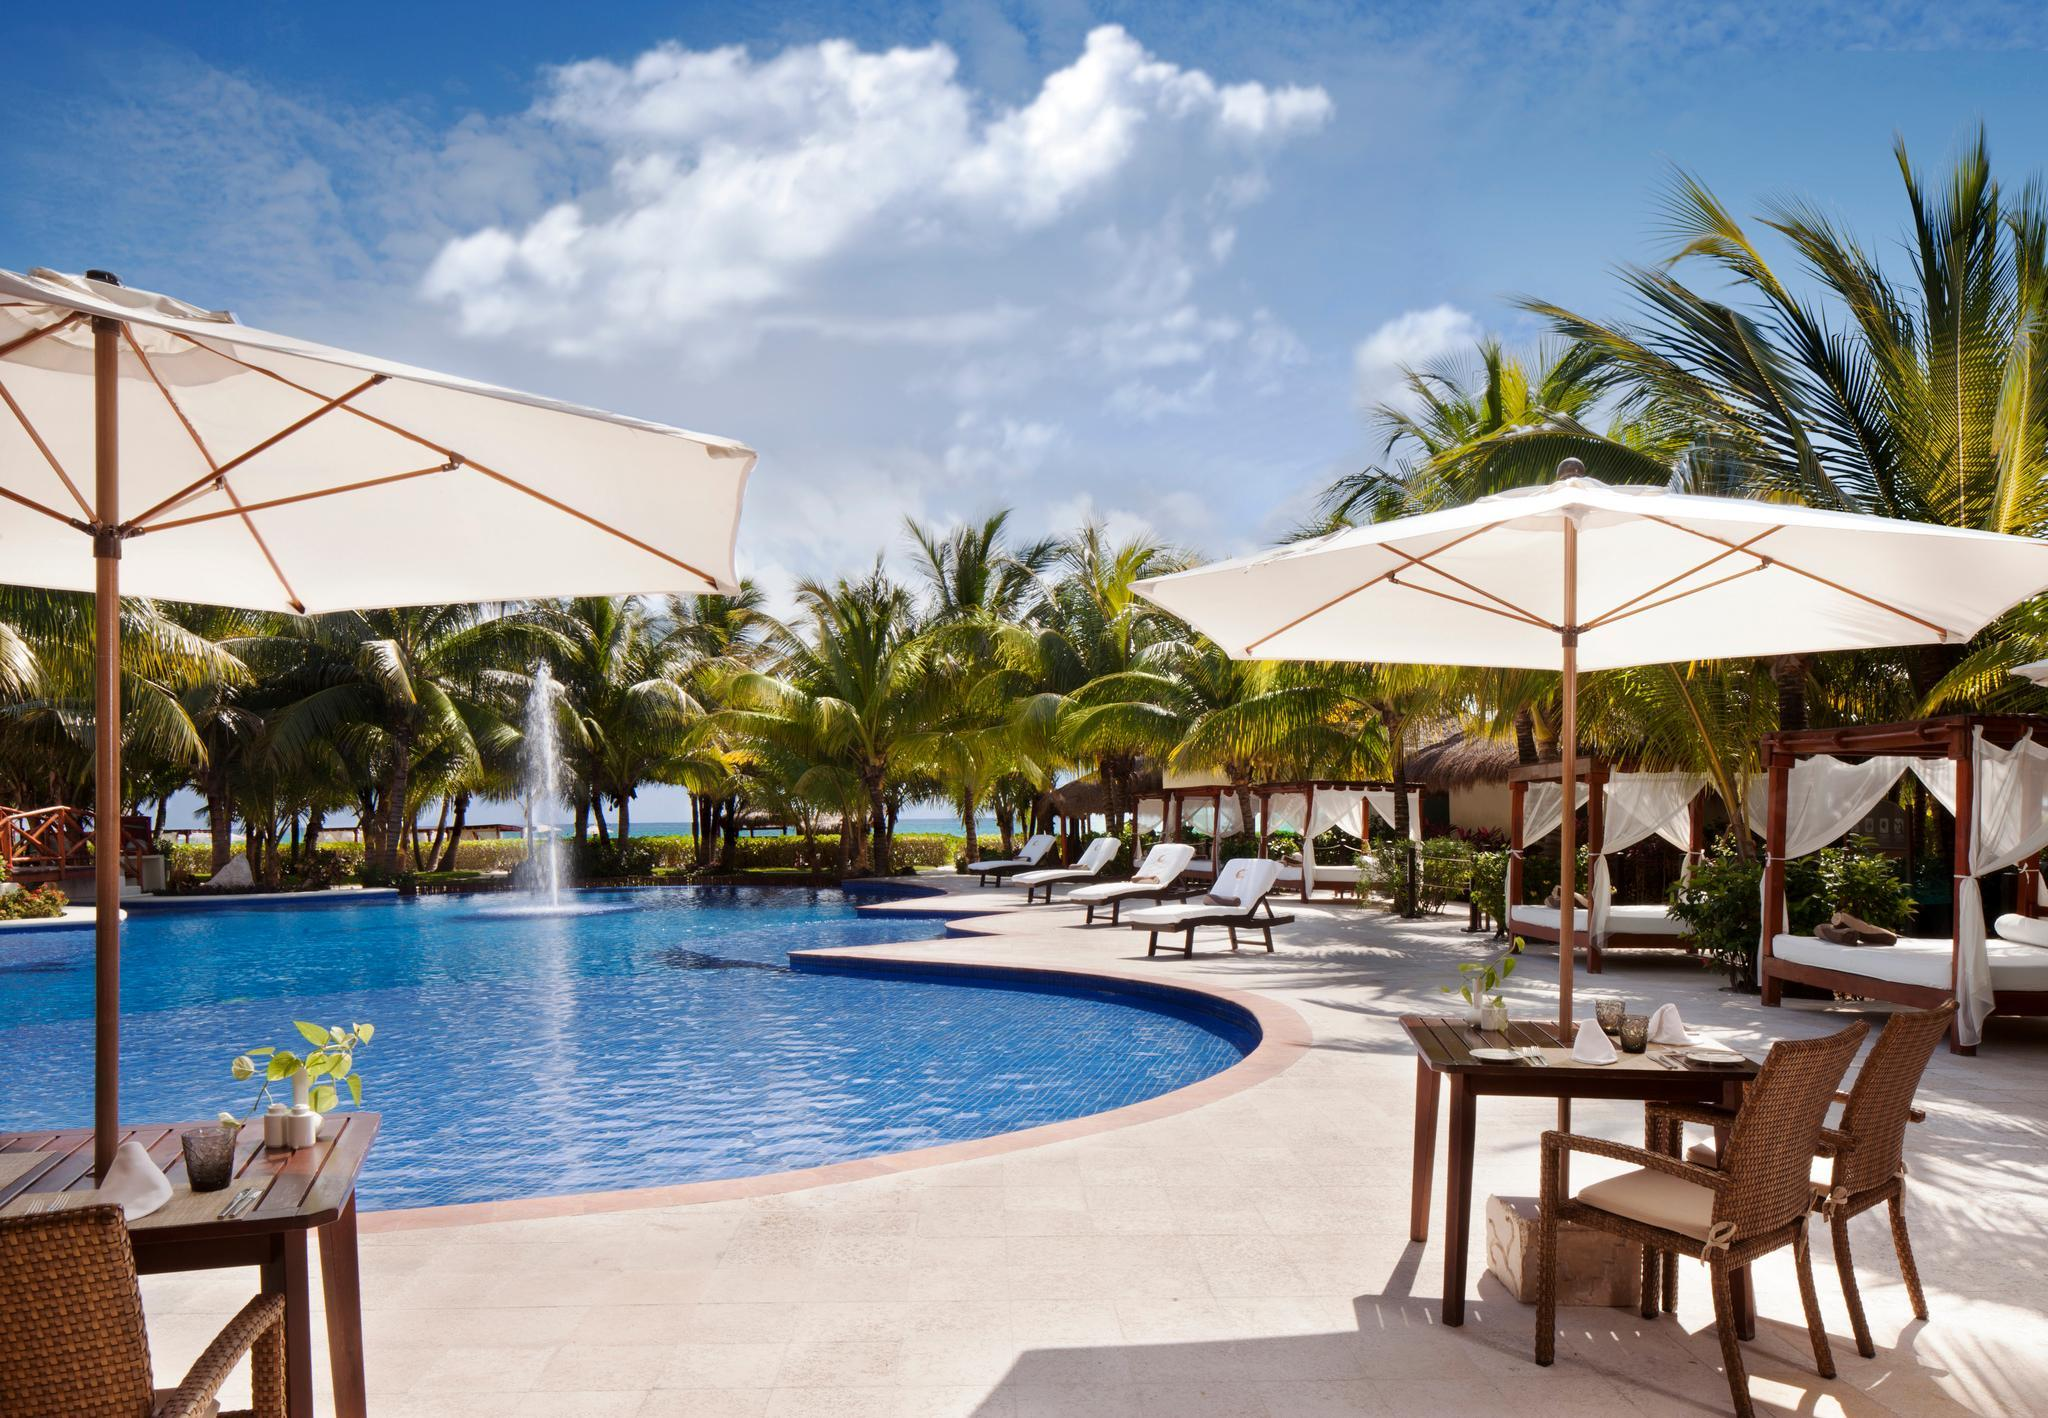 El Dorado Maroma a Spa Resort by Karisma All Inclusive - Adults Only